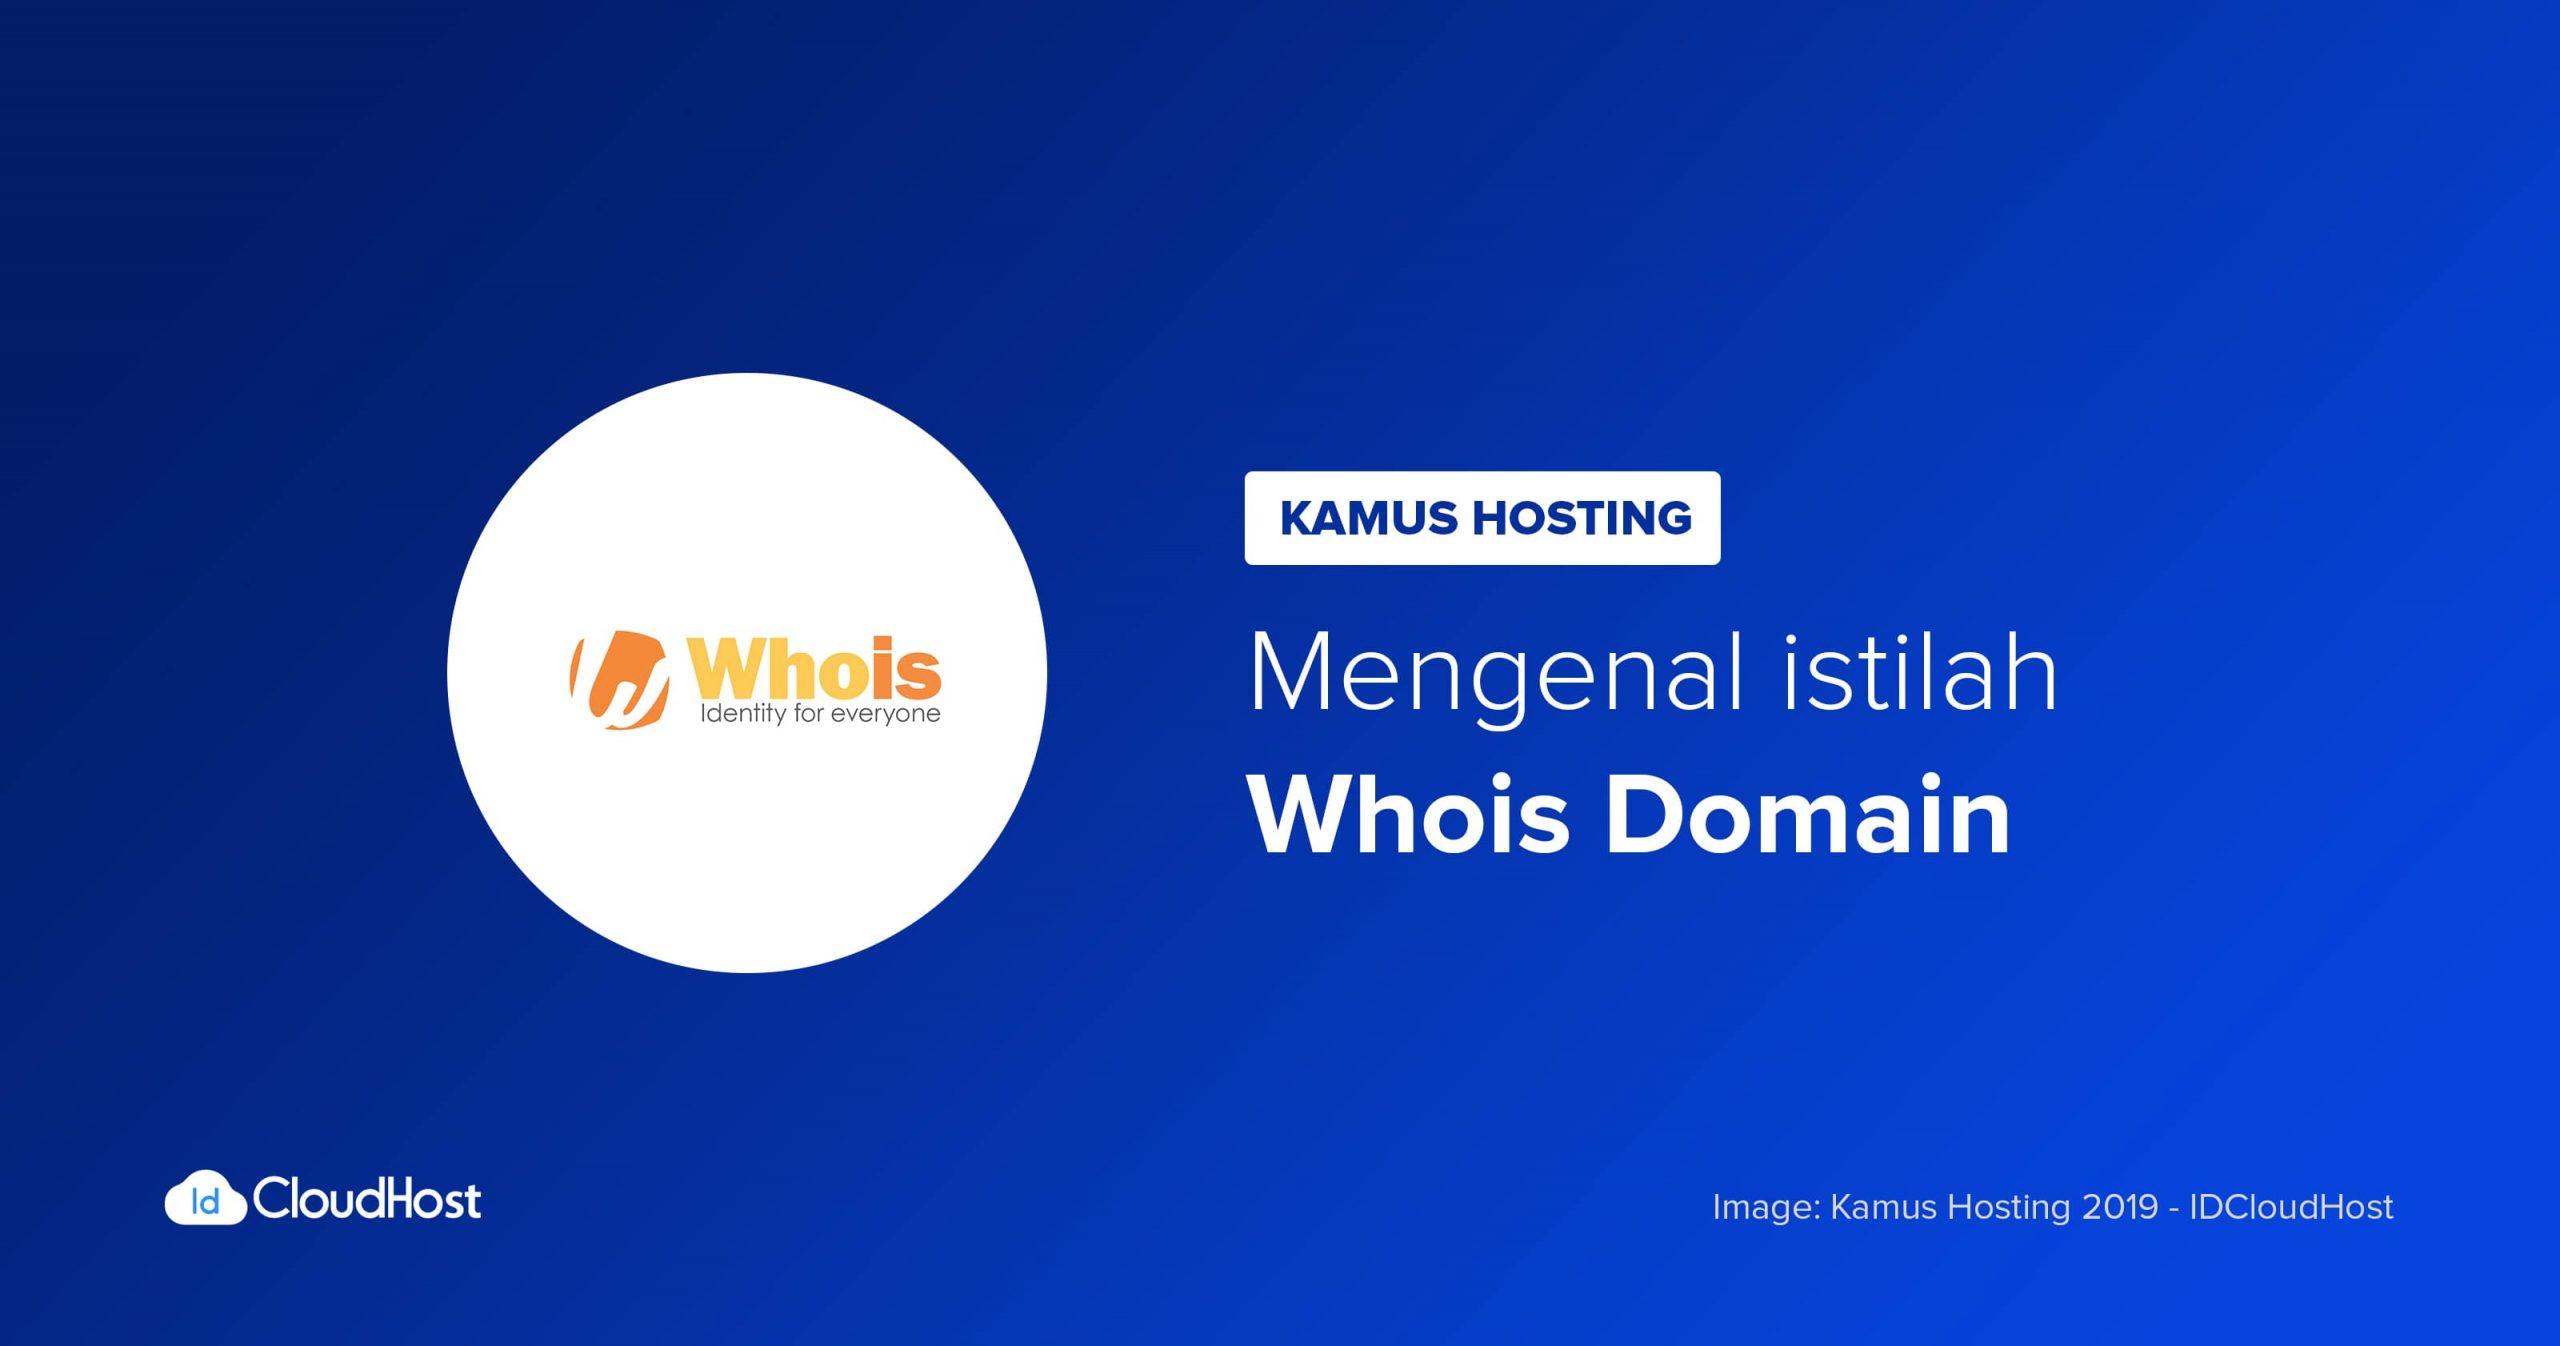 Whois Domain